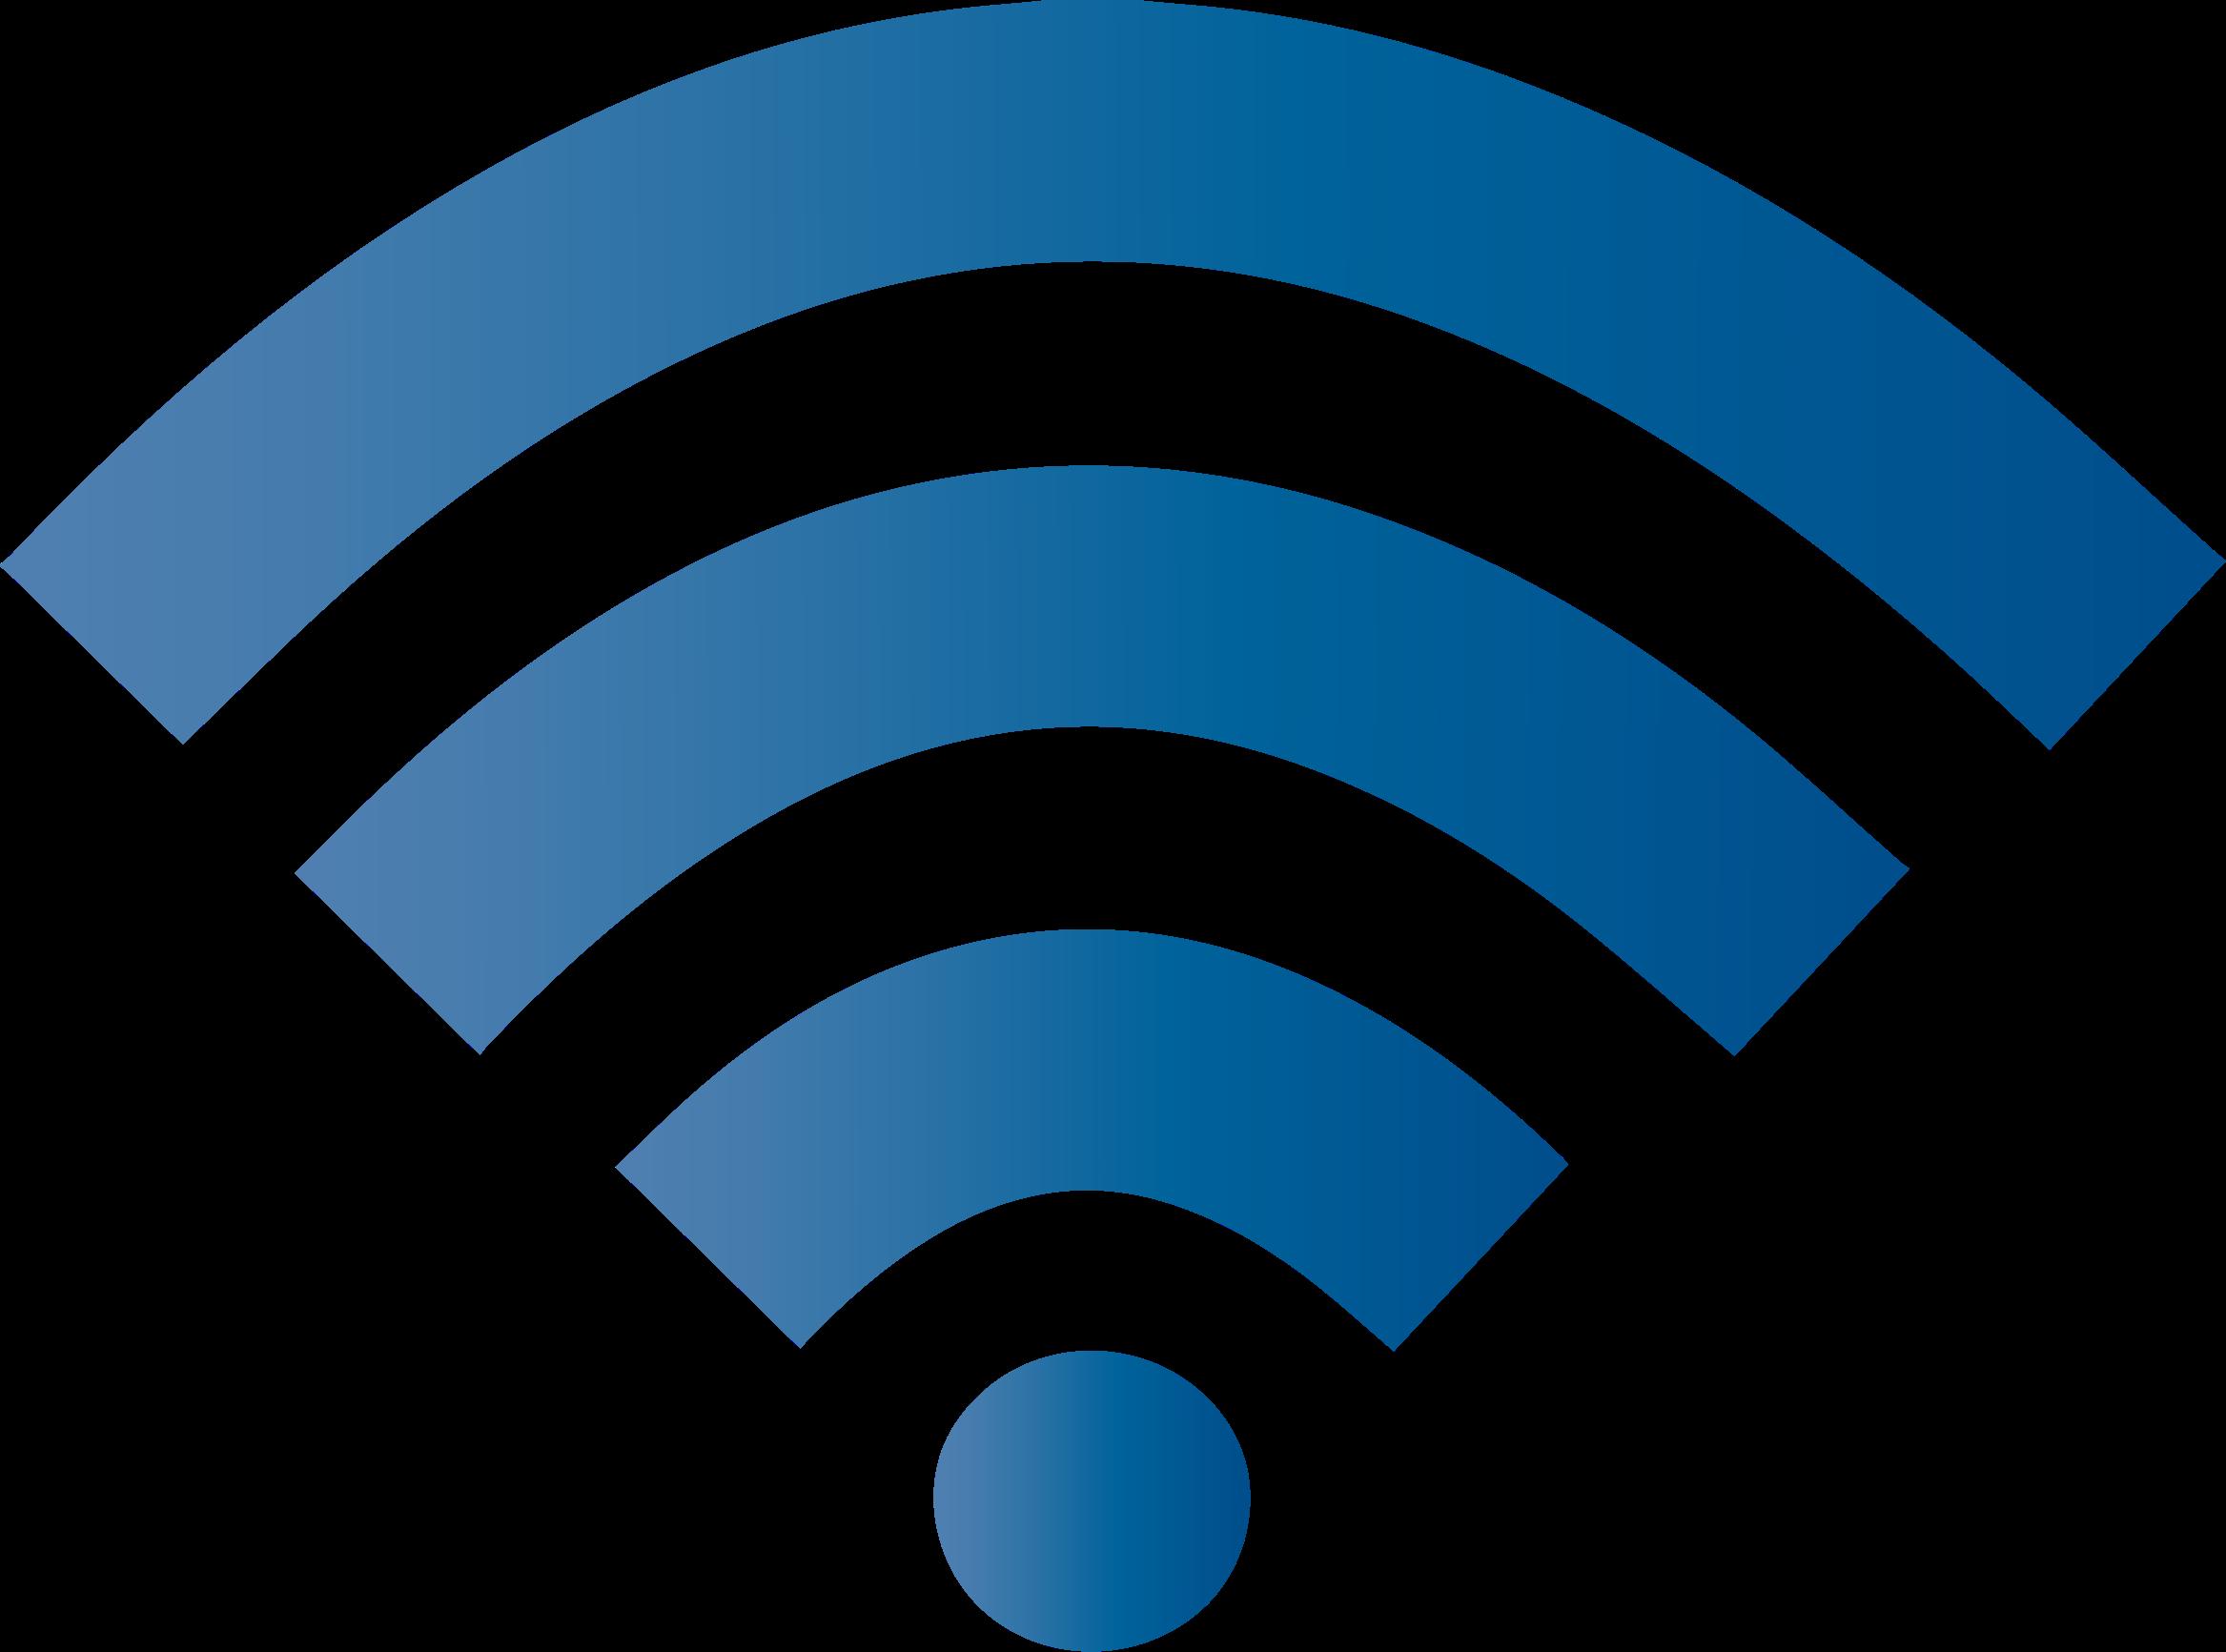 vector transparent Royal blue big image. Wifi clipart